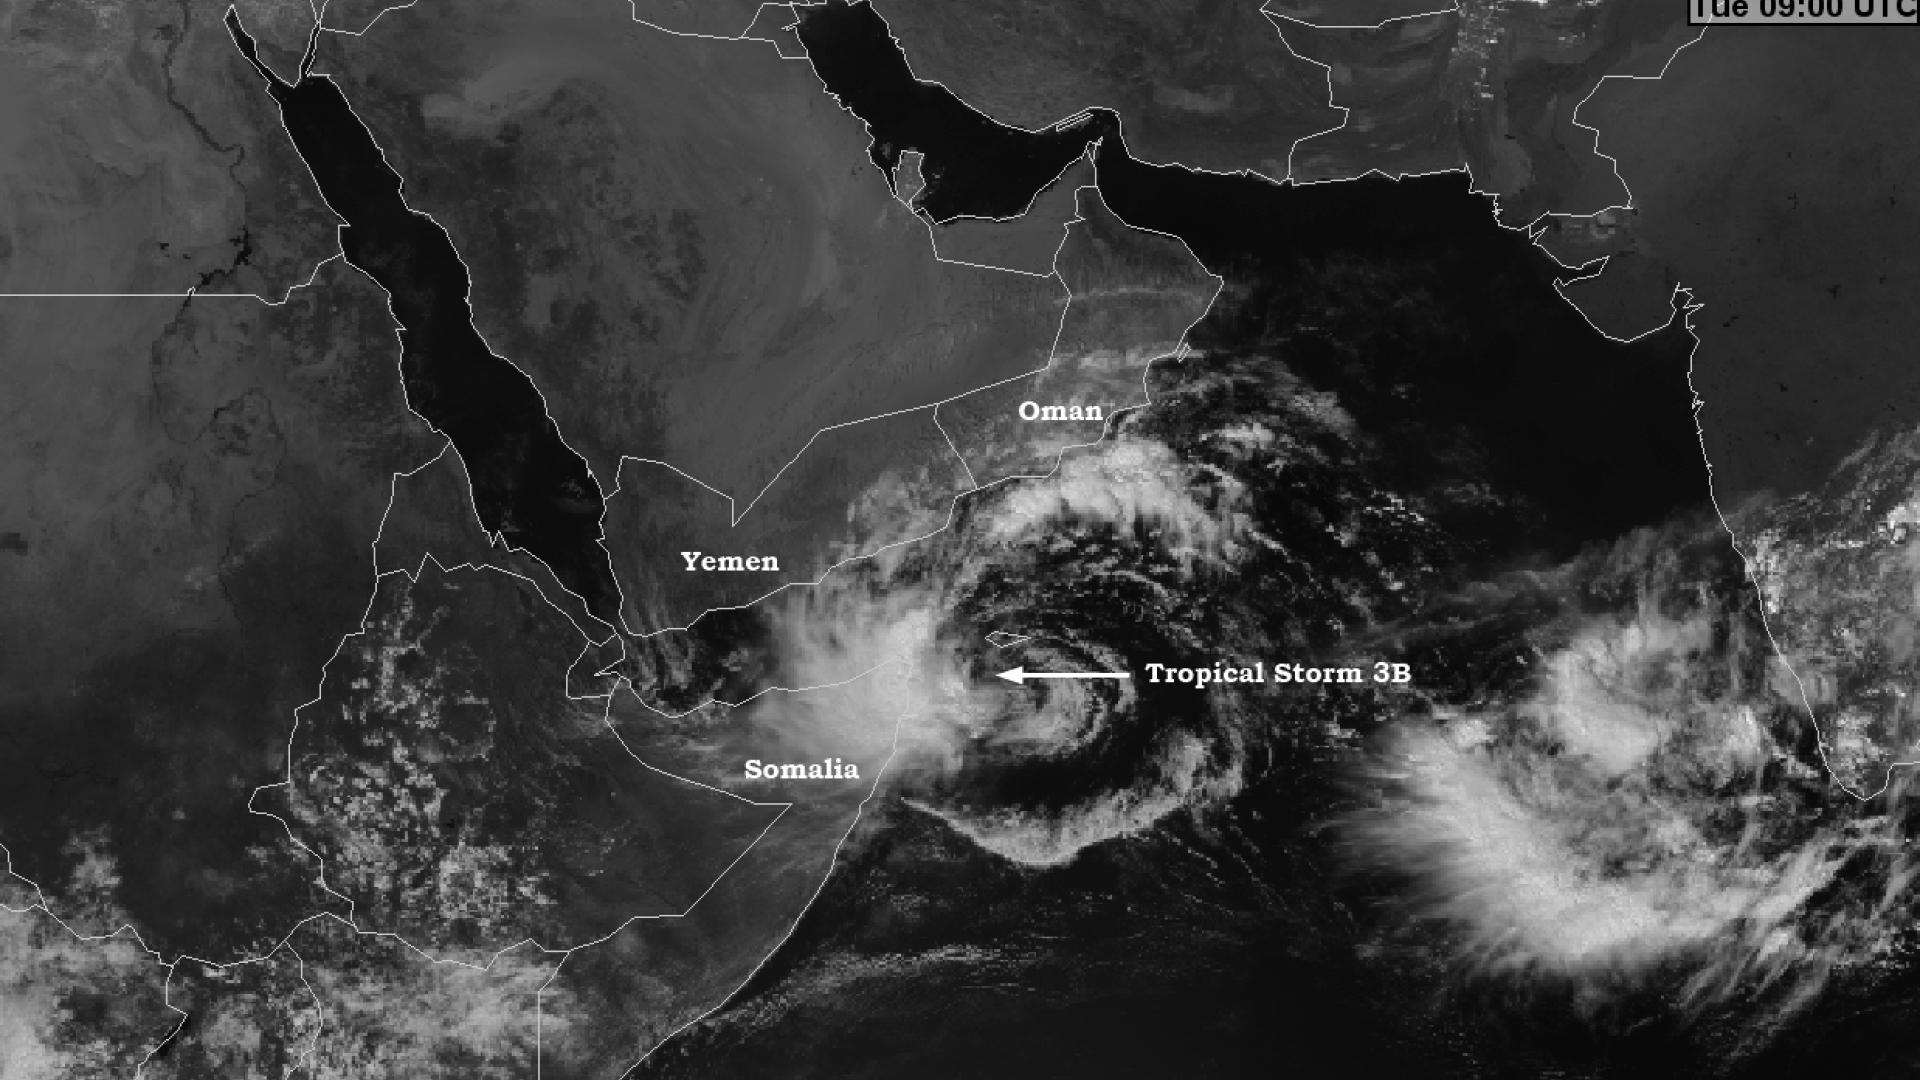 Tropical Depression 03B